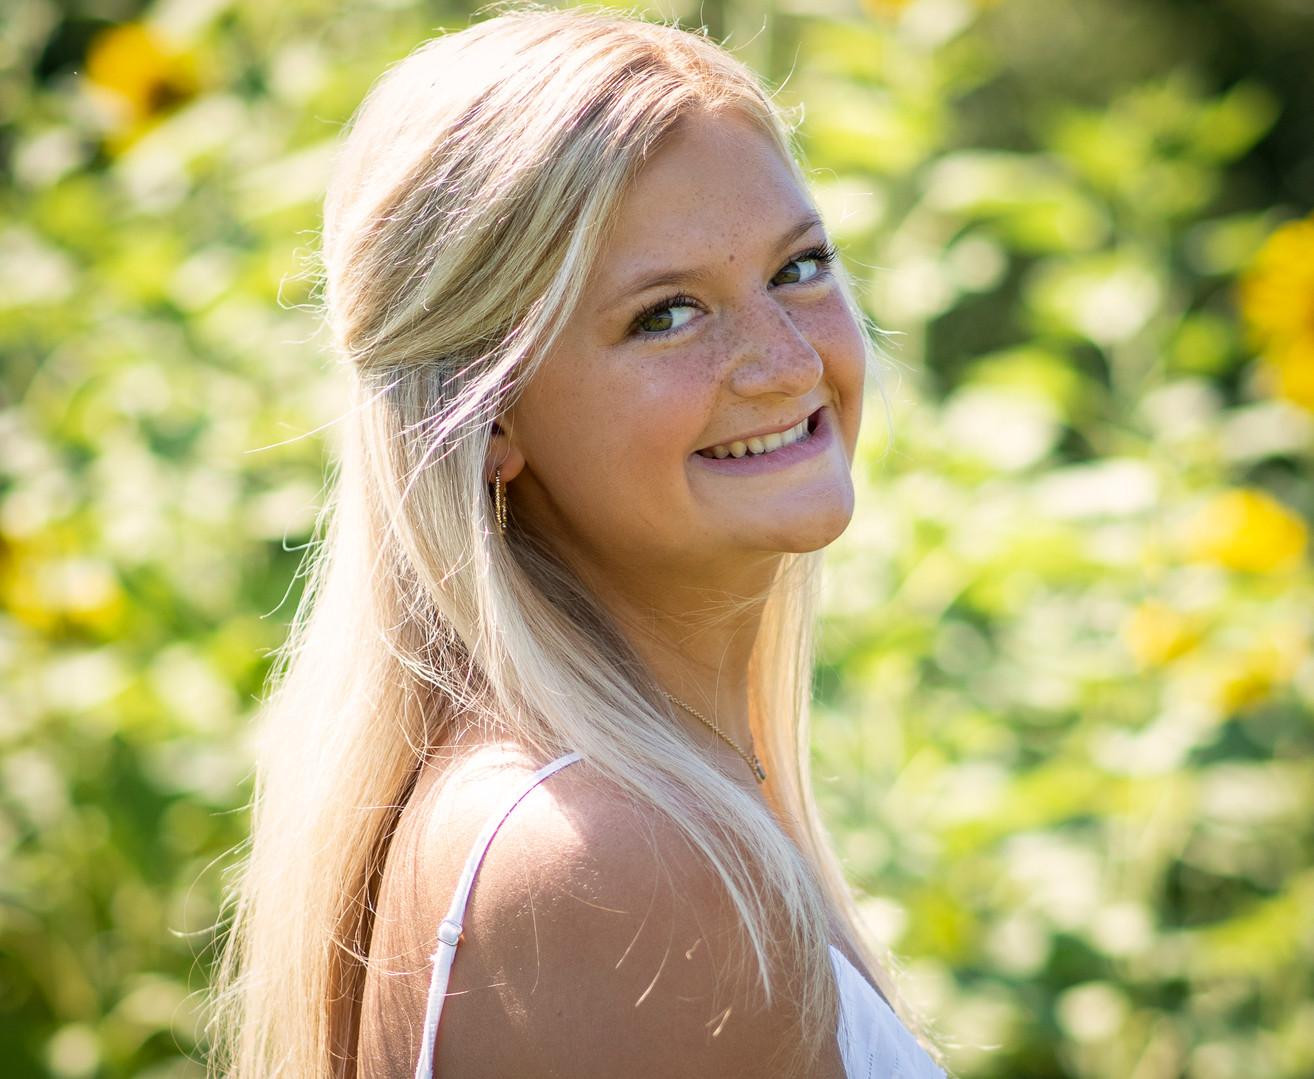 high school senior girl with flowers